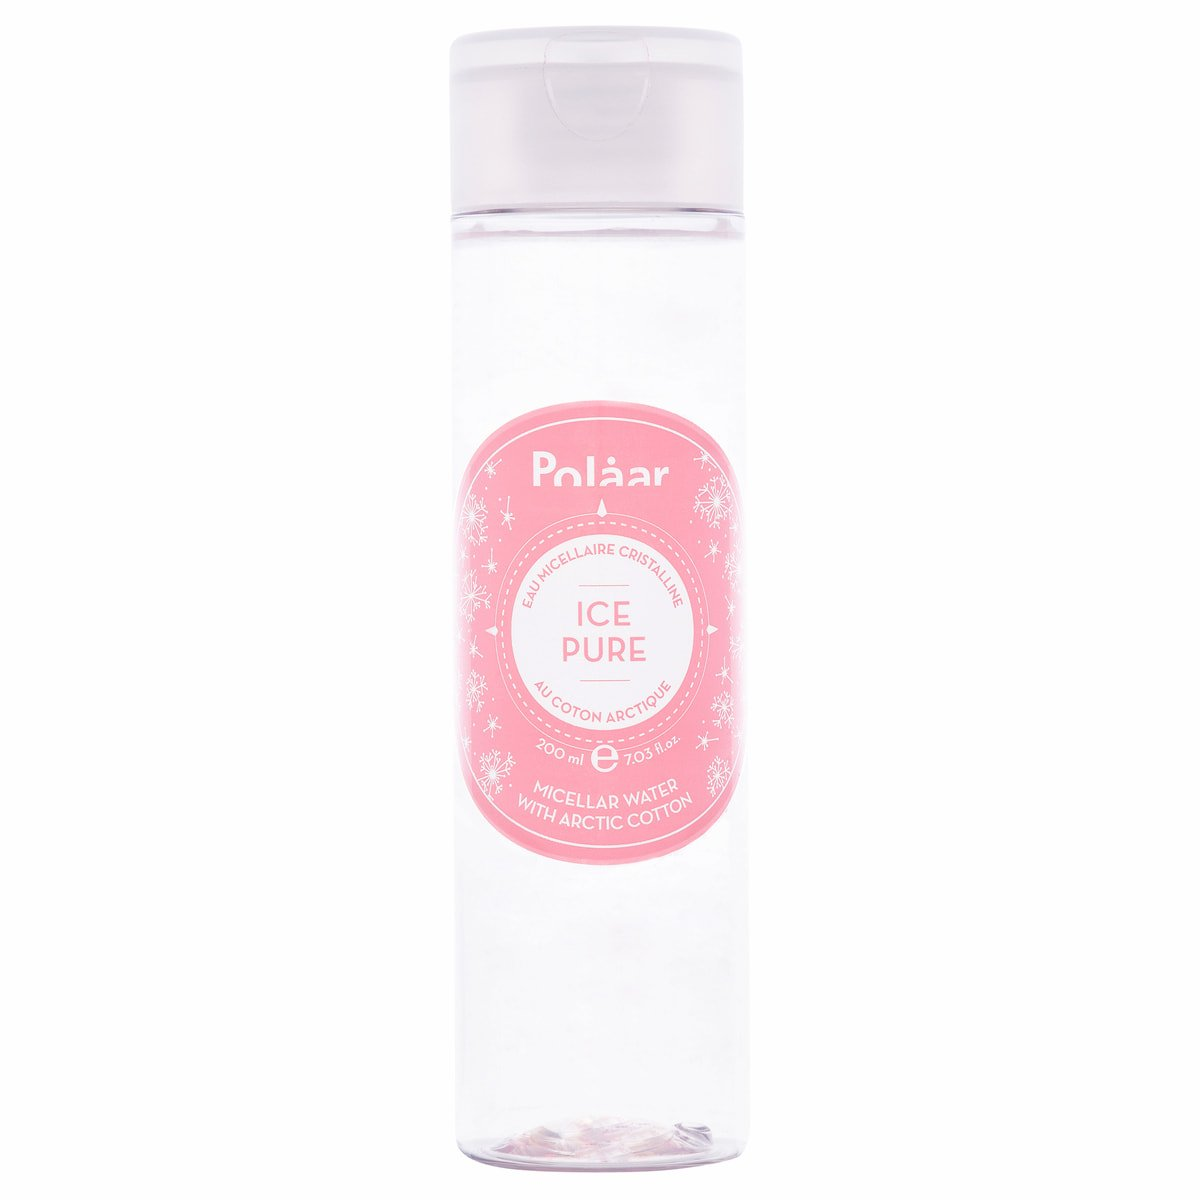 Polaar - IcePure - Eau micellaire cristalline